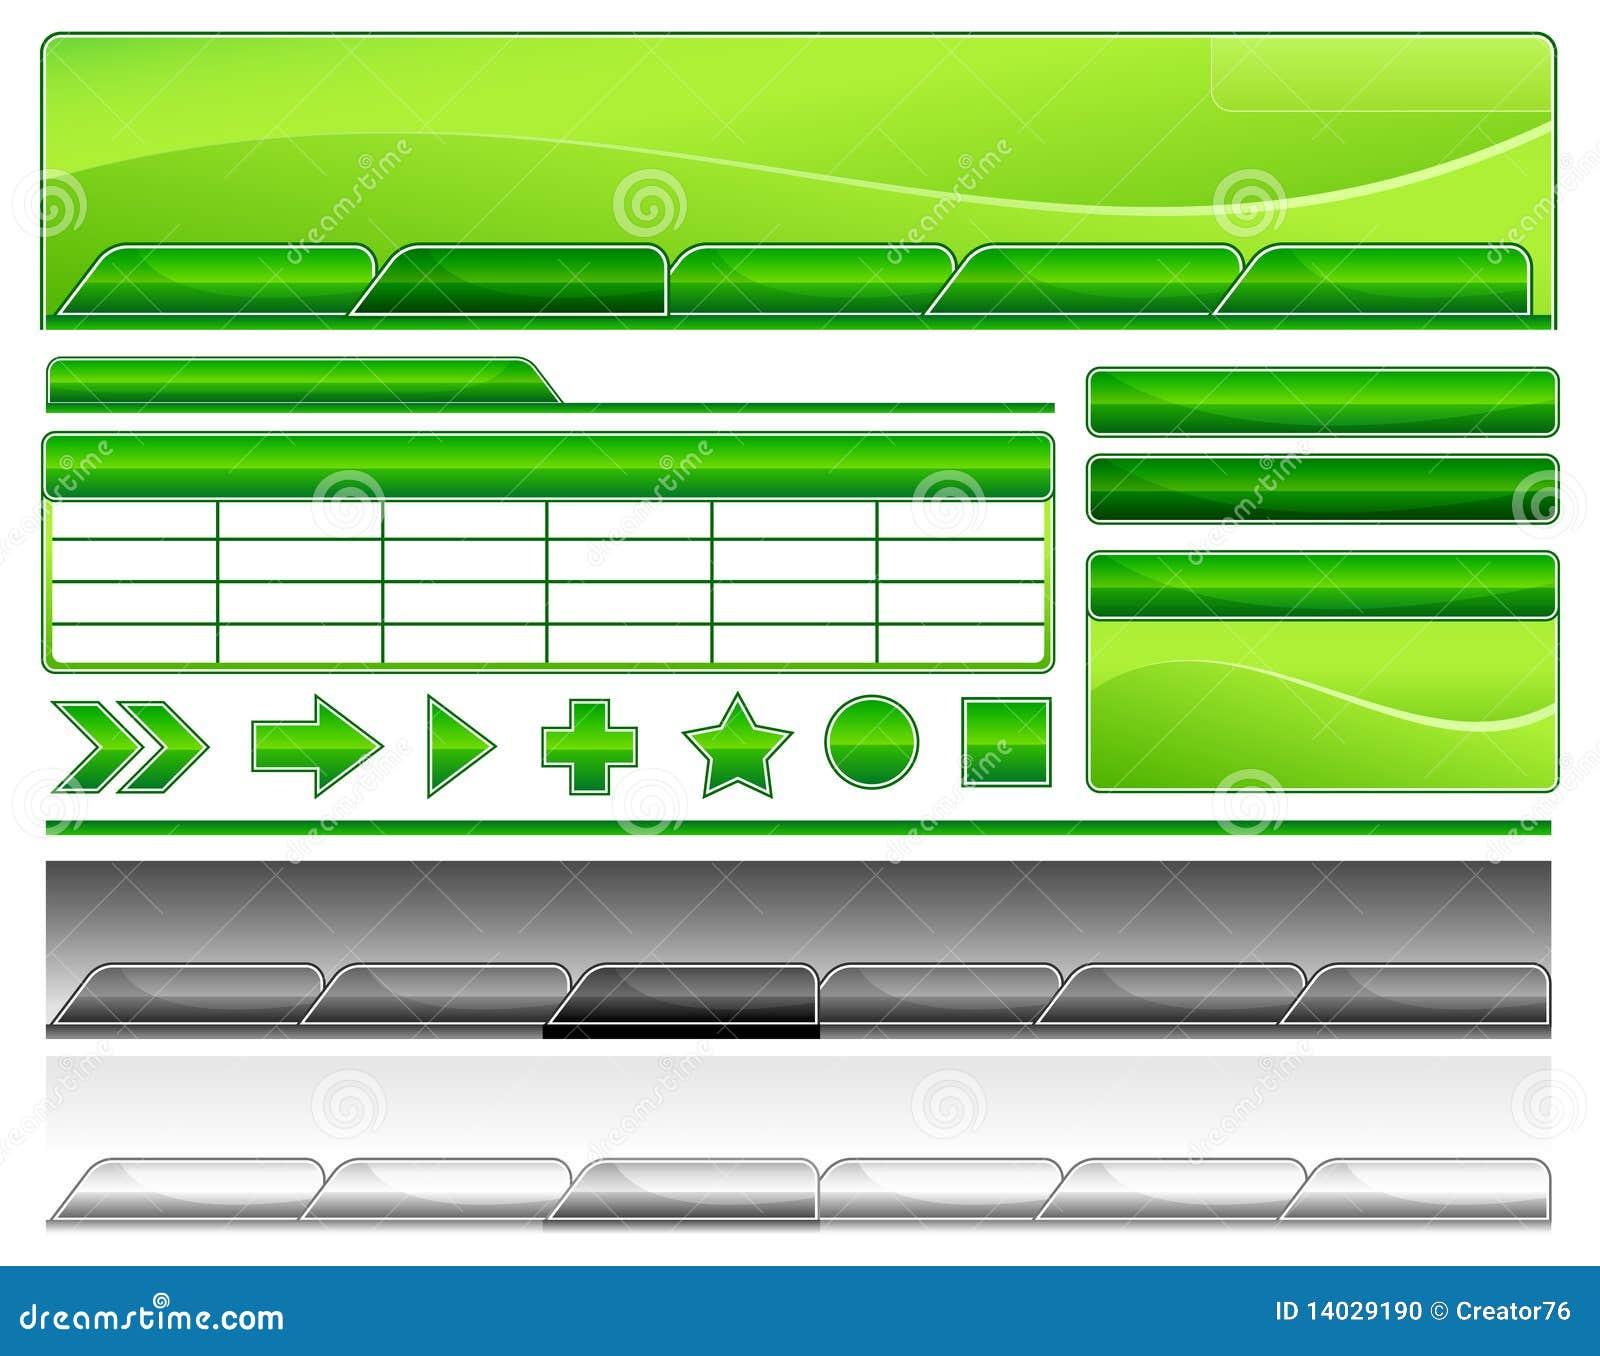 web templates stock photo image 14029190